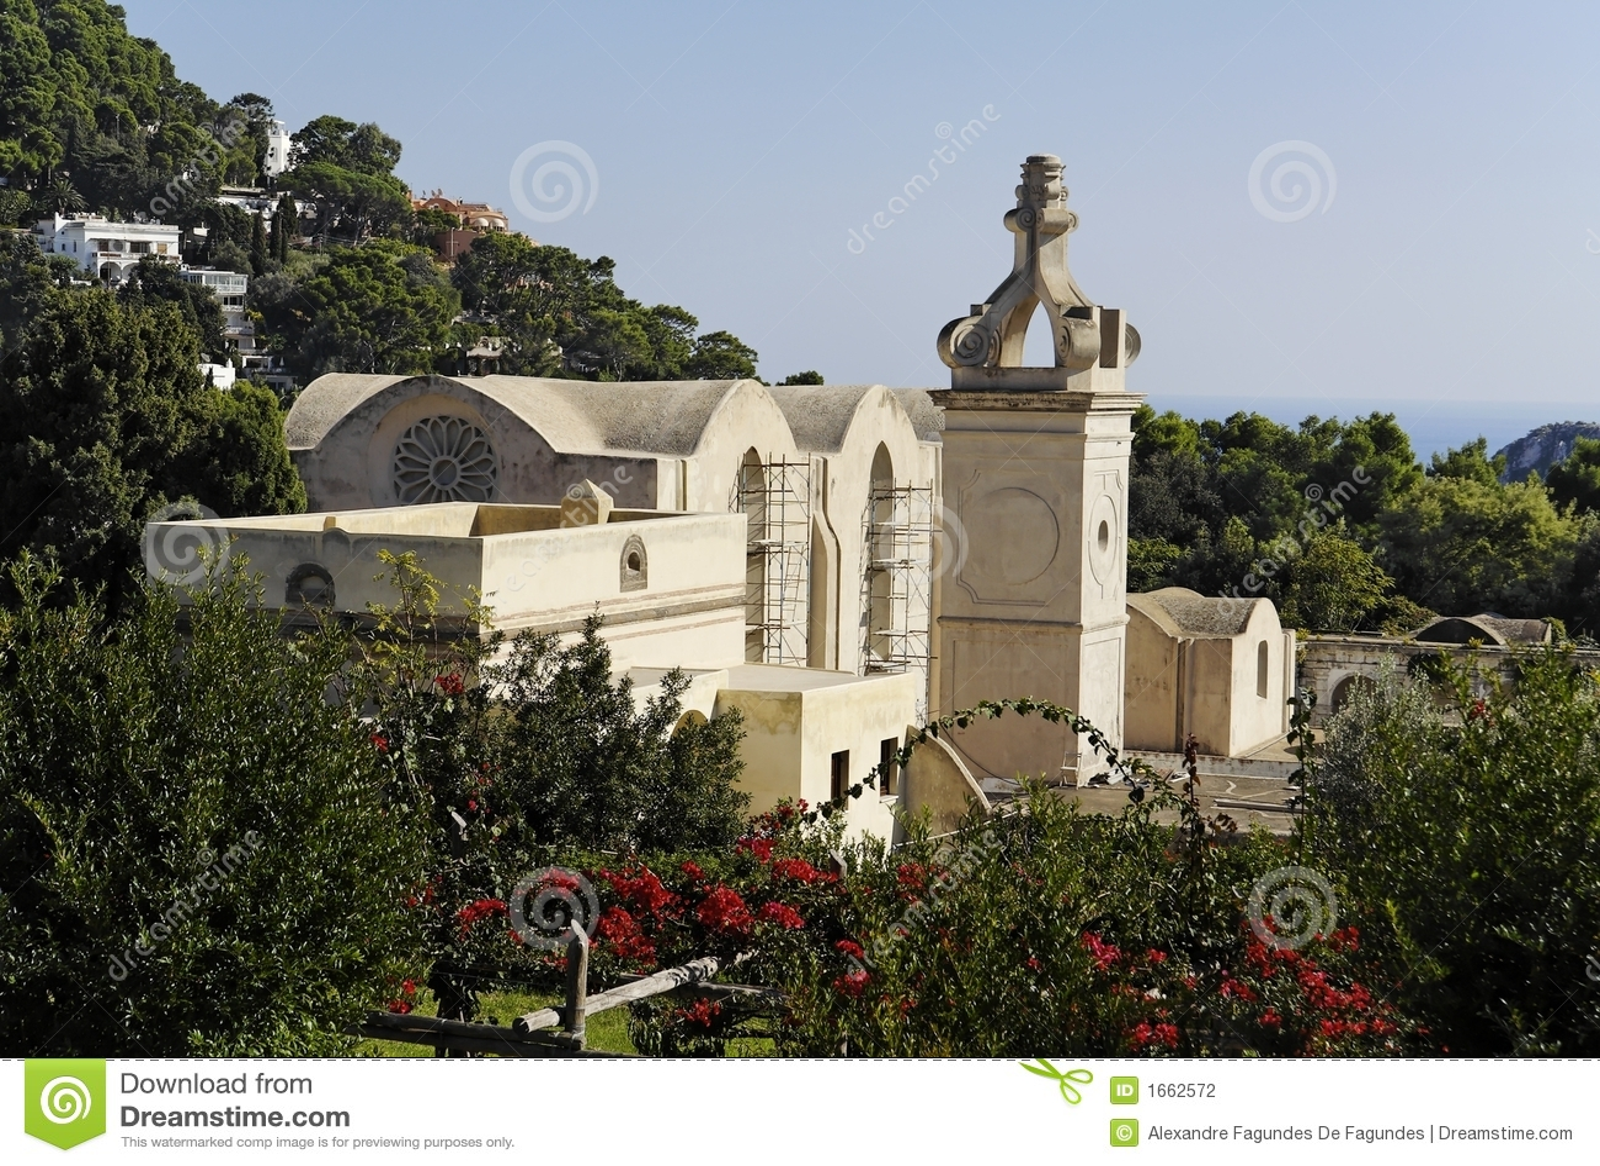 Giardino e chiesa - Capri